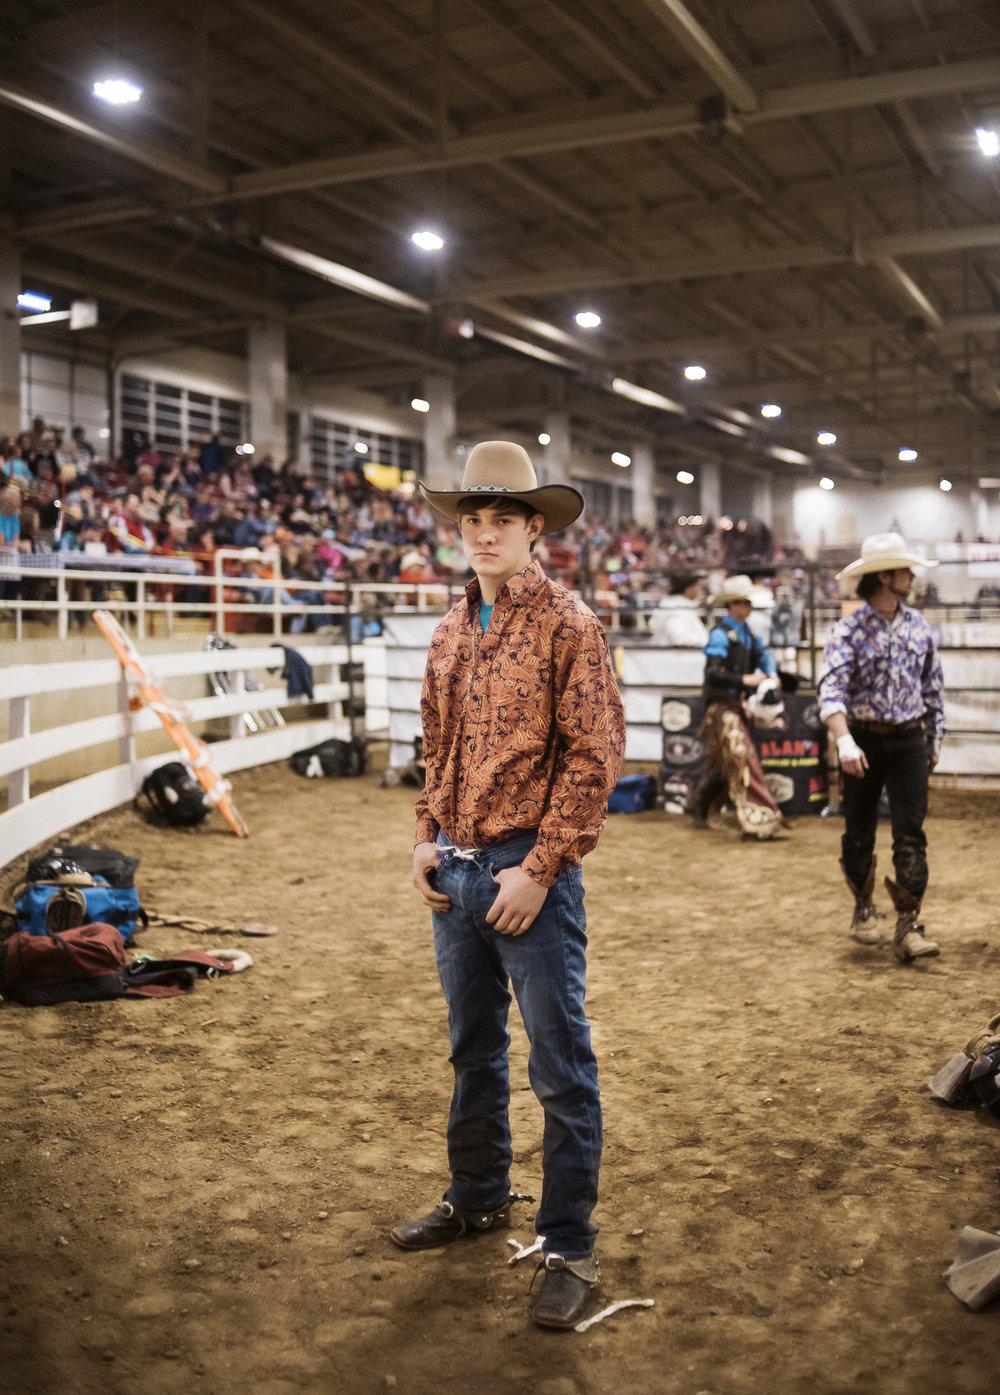 Portrait of bullrider at BullMania 2017 rodeo event in asheville North Carolina by Jack Sorokin